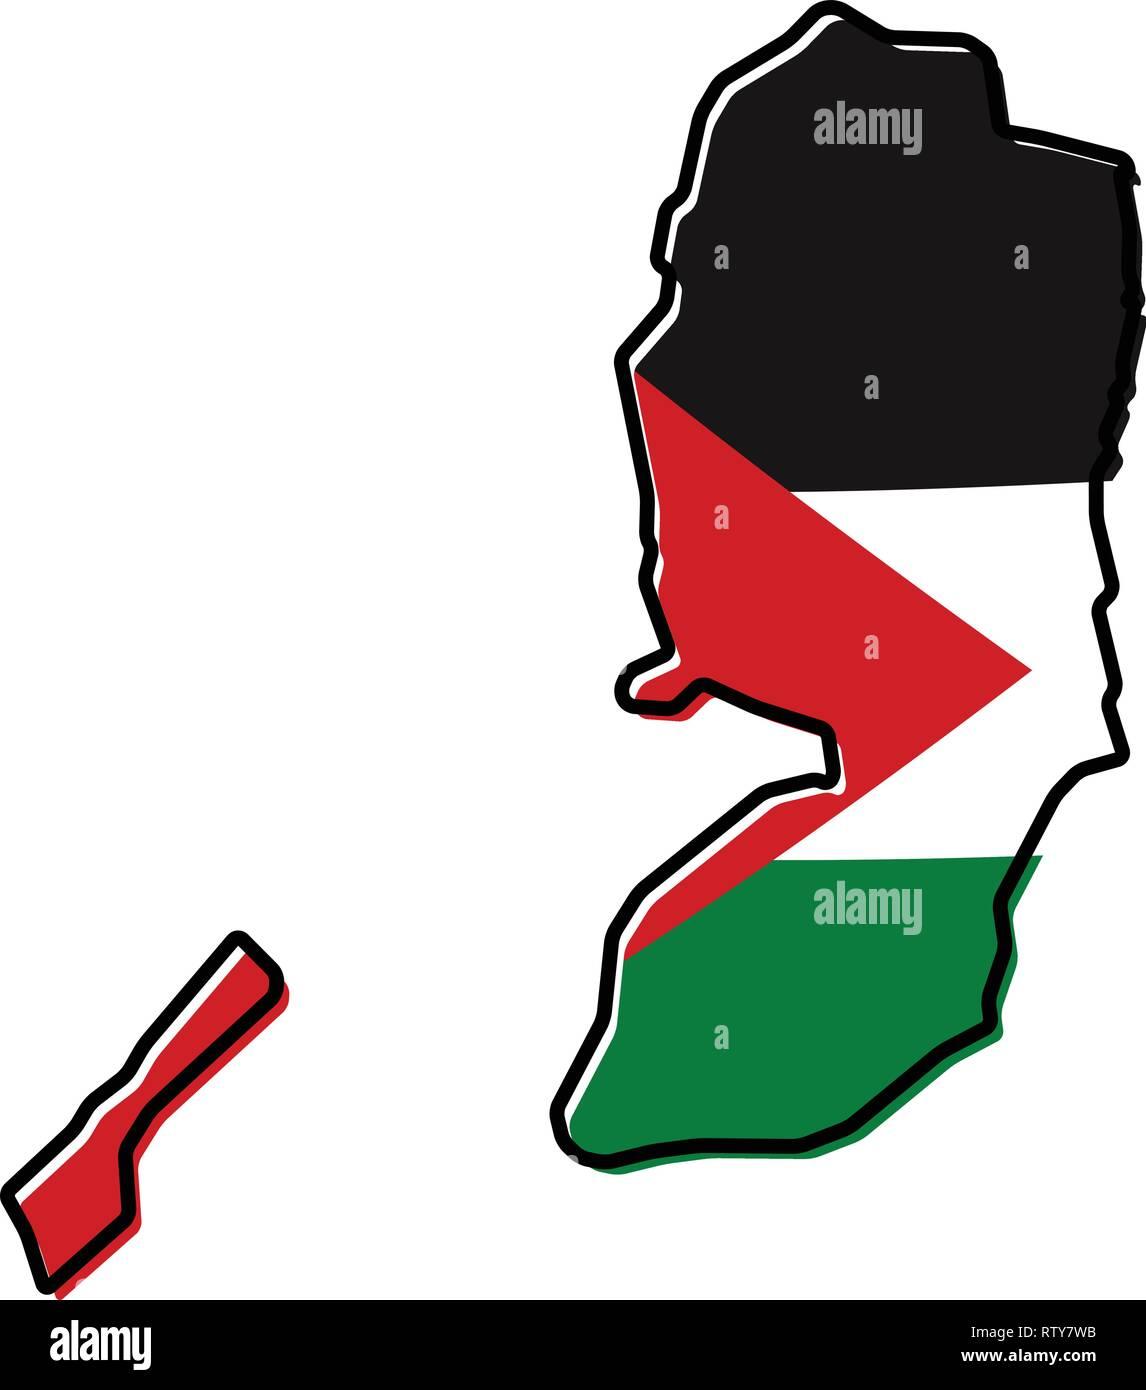 Franja De Gaza Mapa.Mapa Simplificado De Palestina Cisjordania Y La Franja De